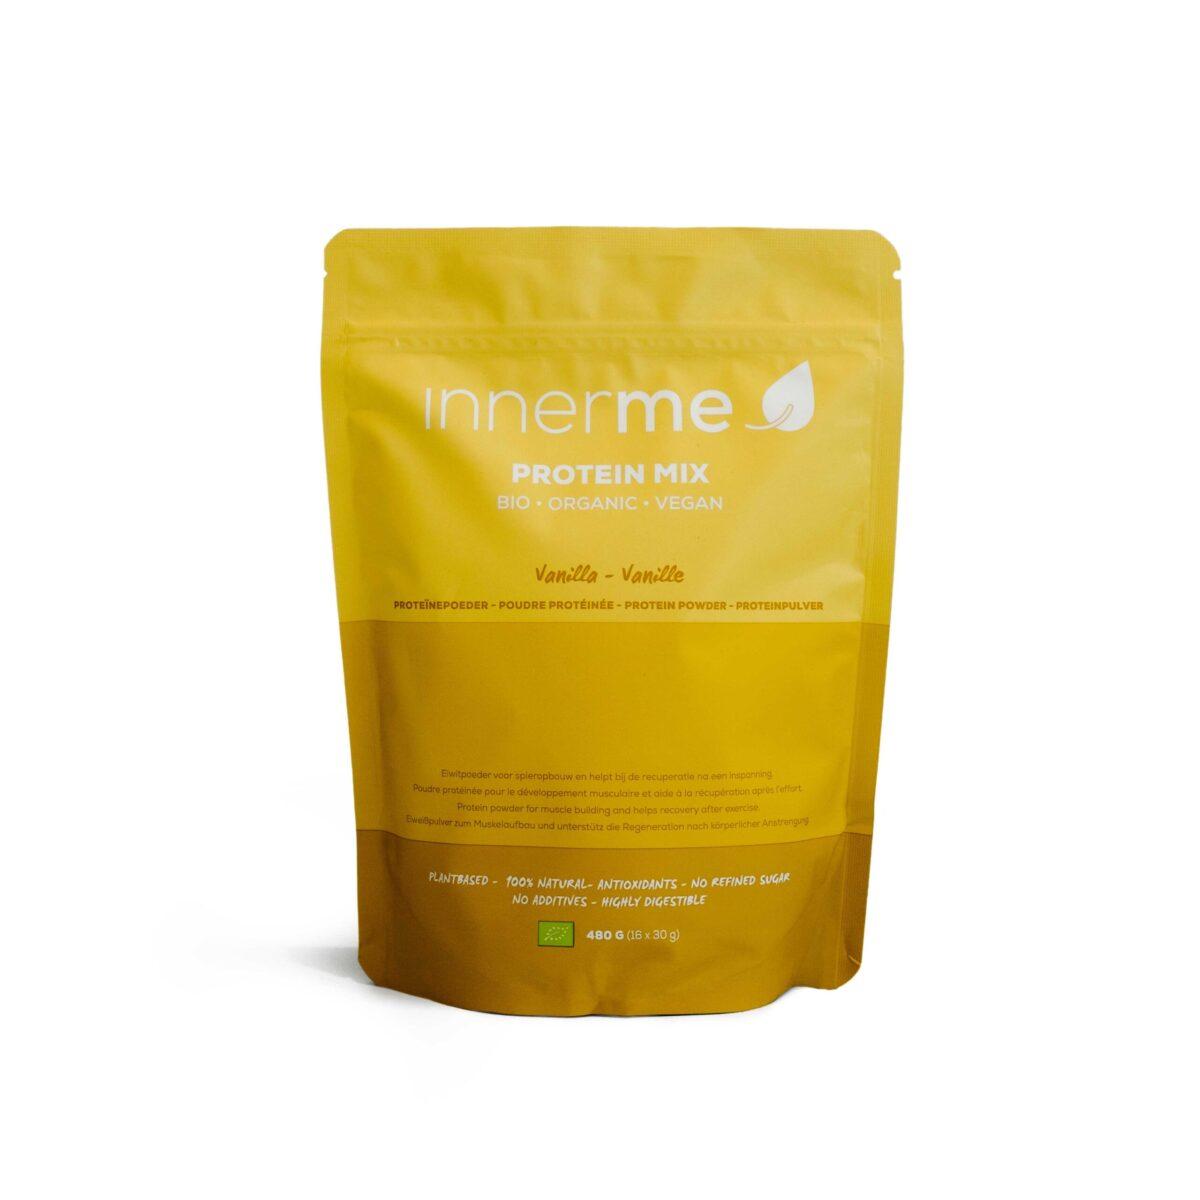 Mix Proteína Baunilha Bio & Vegan Innerme (480g) - Moonsport